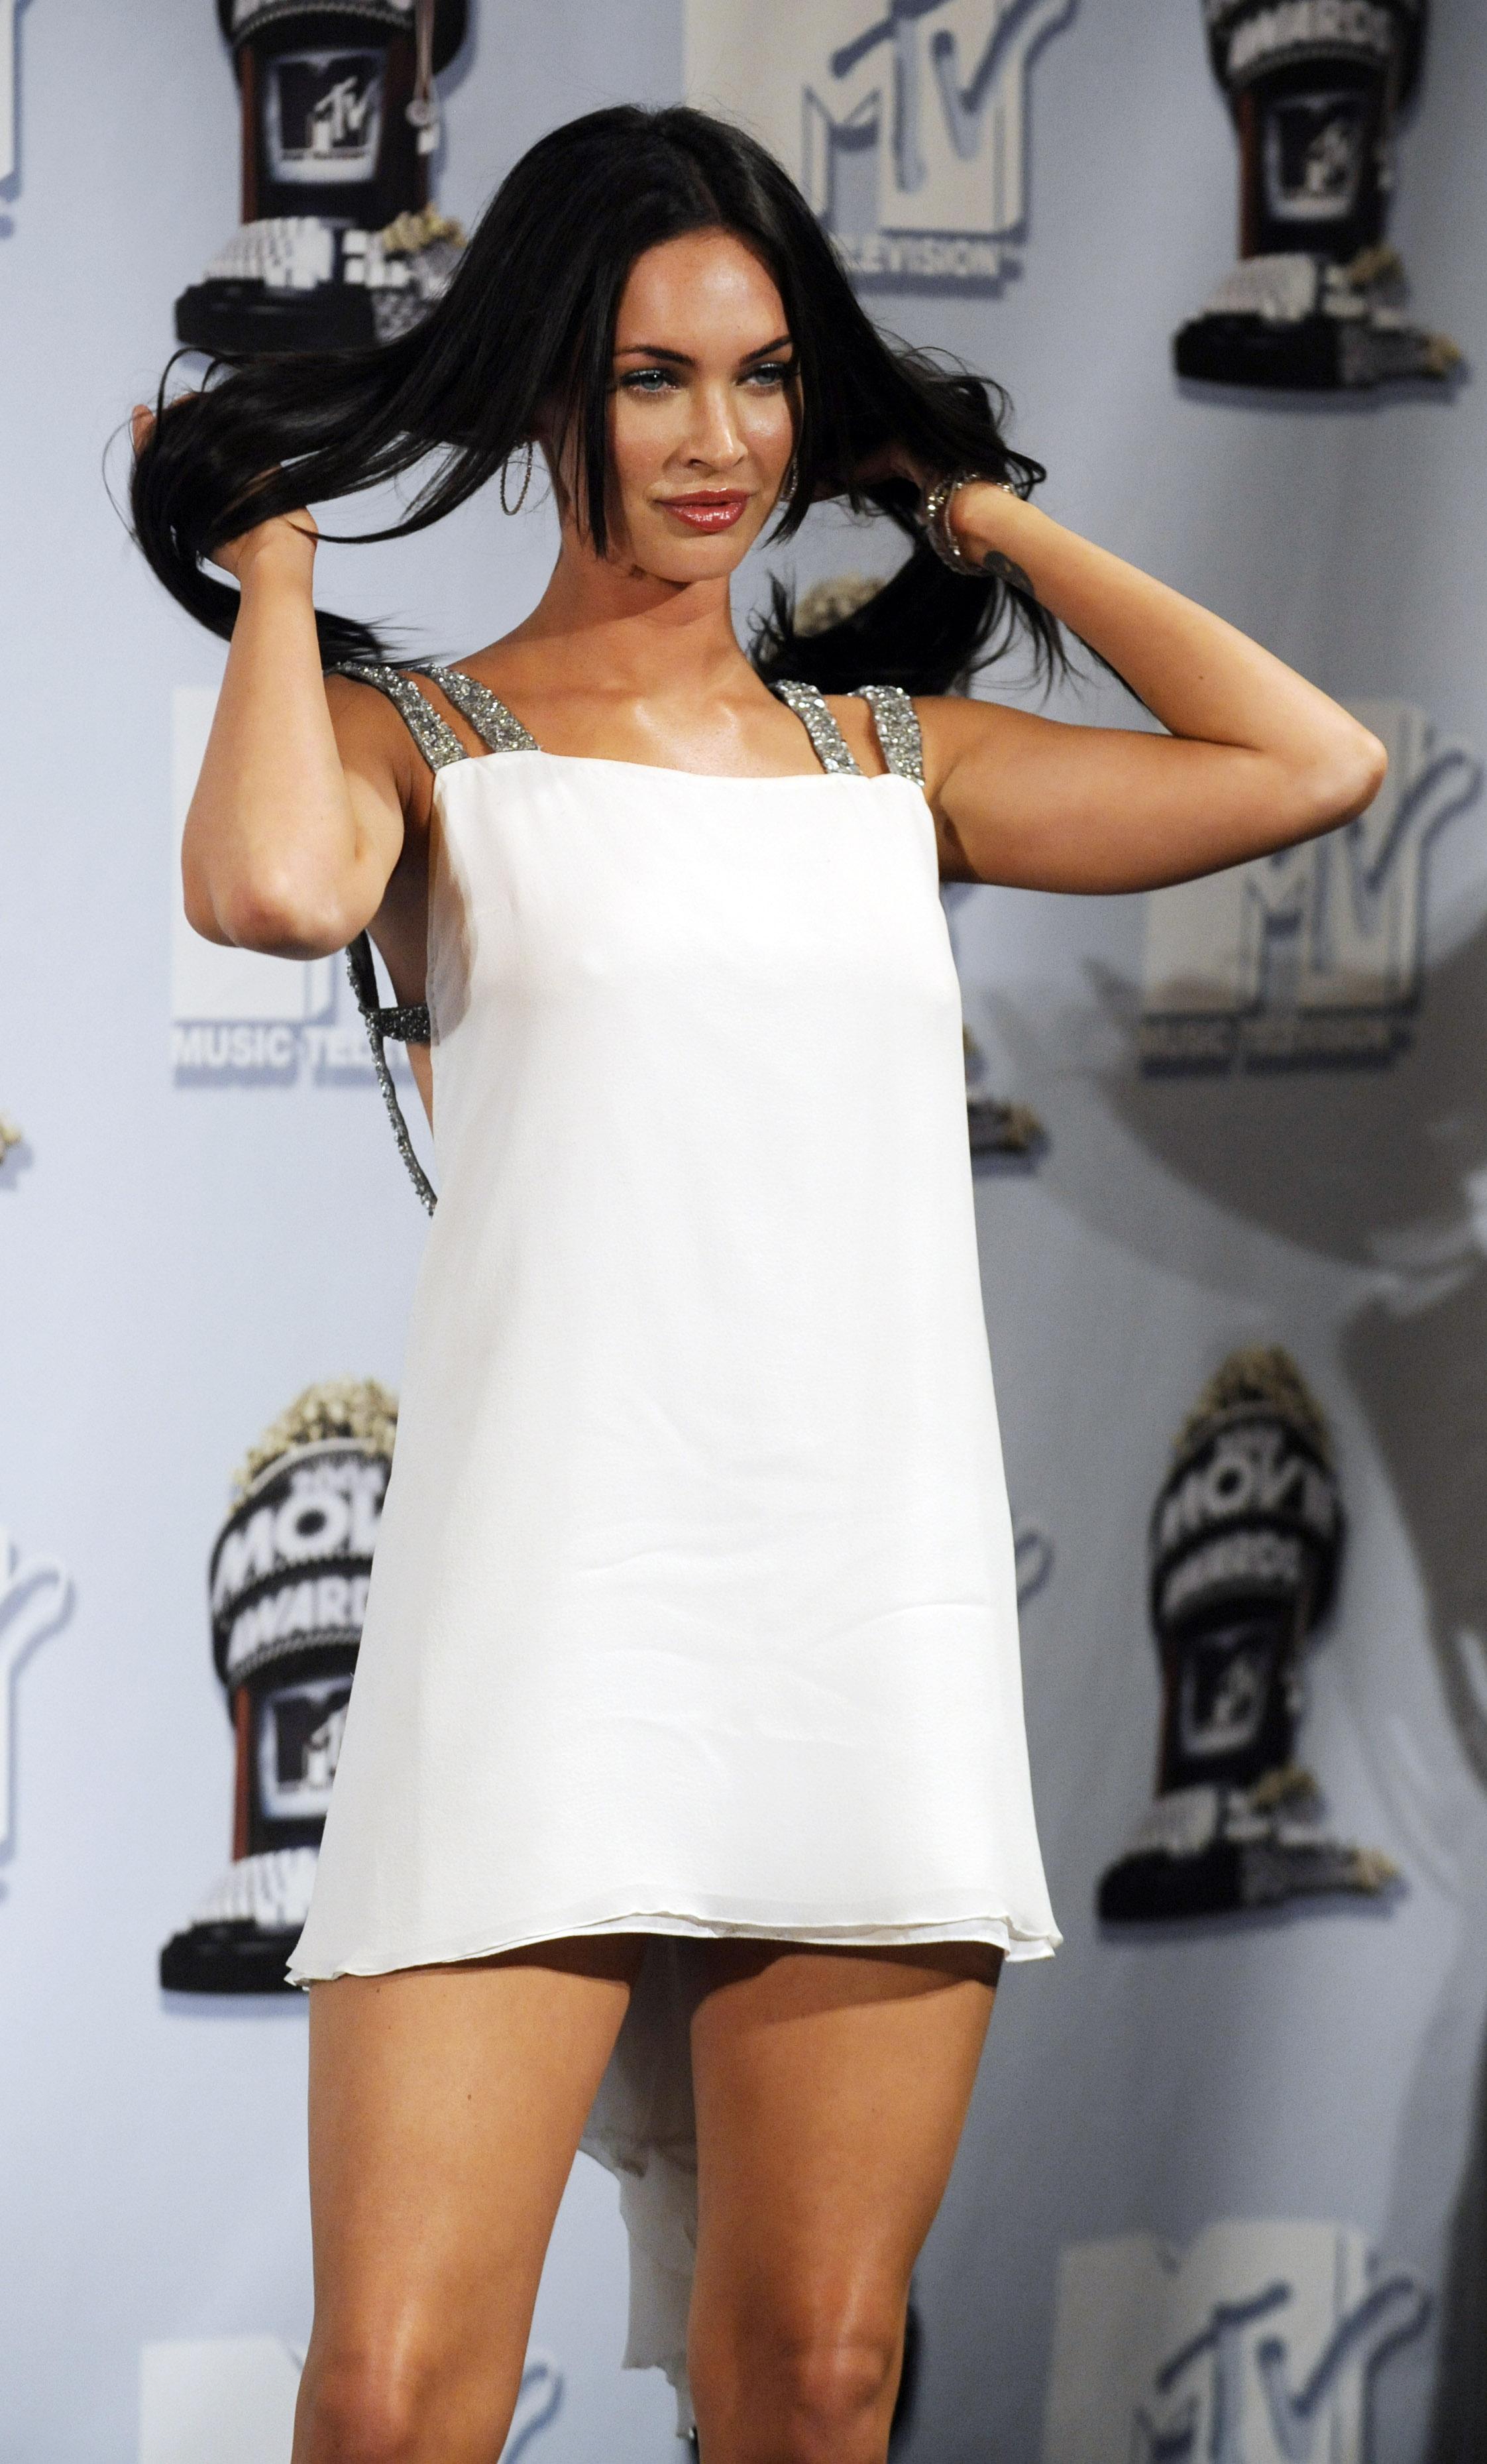 Megan_Fox___MTV_Movie_Awards_backstage__CU_ISA_010608_02_122_392lo.jpg